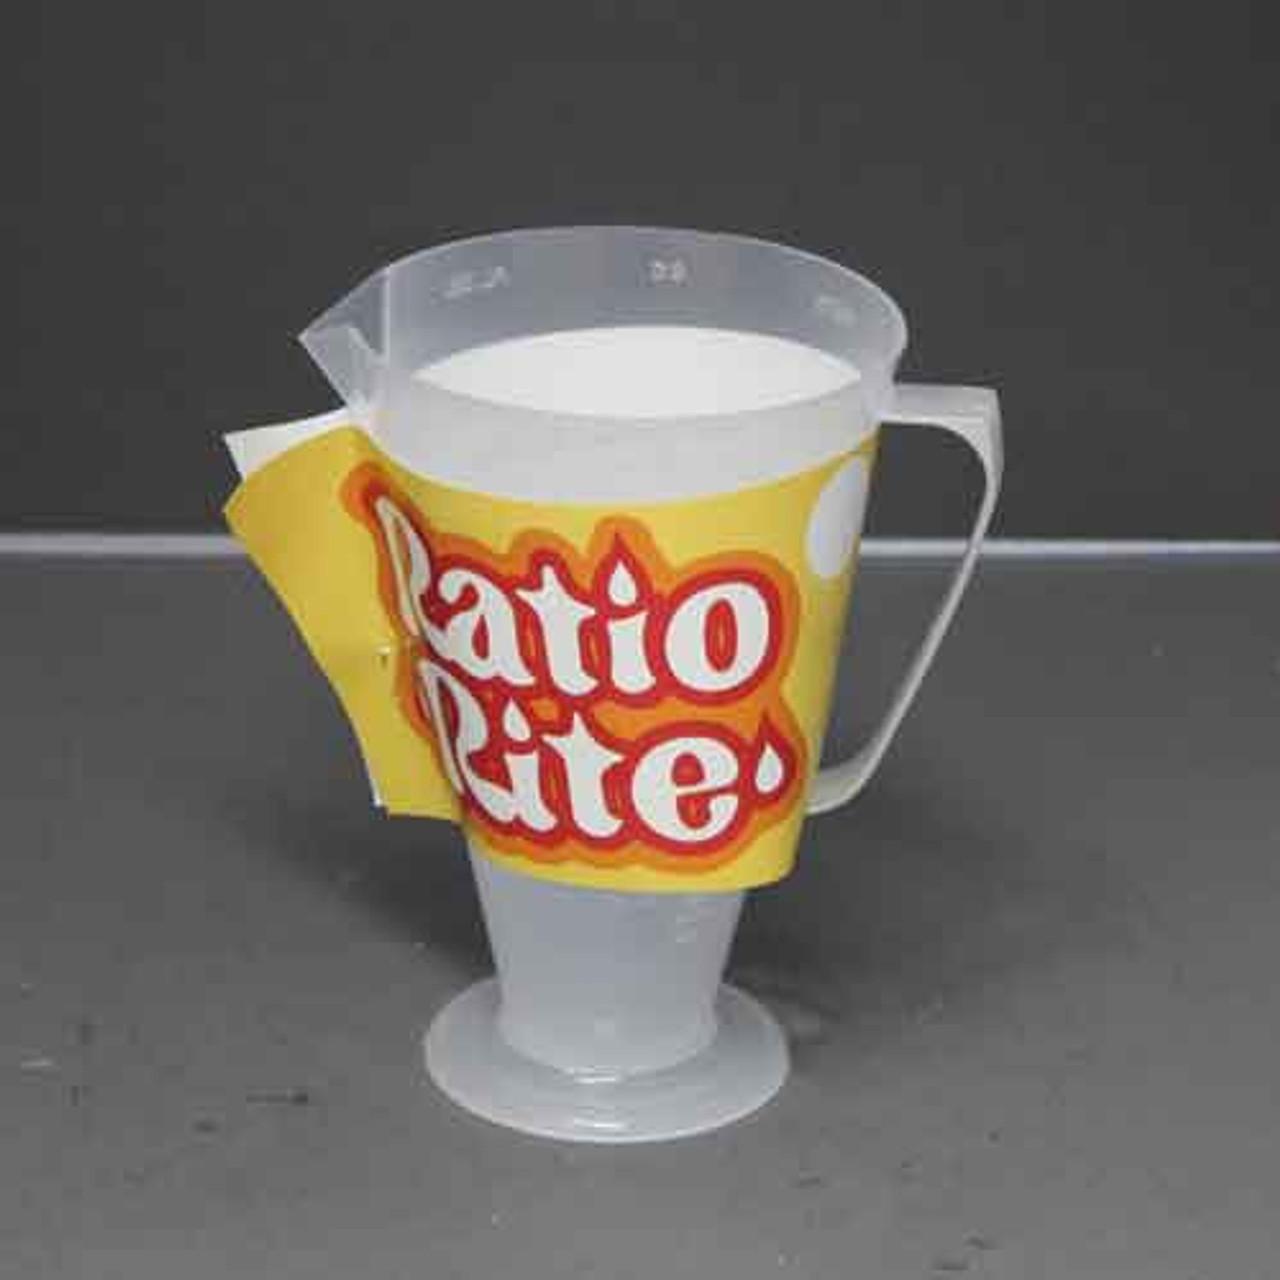 Ratio Rite Cup